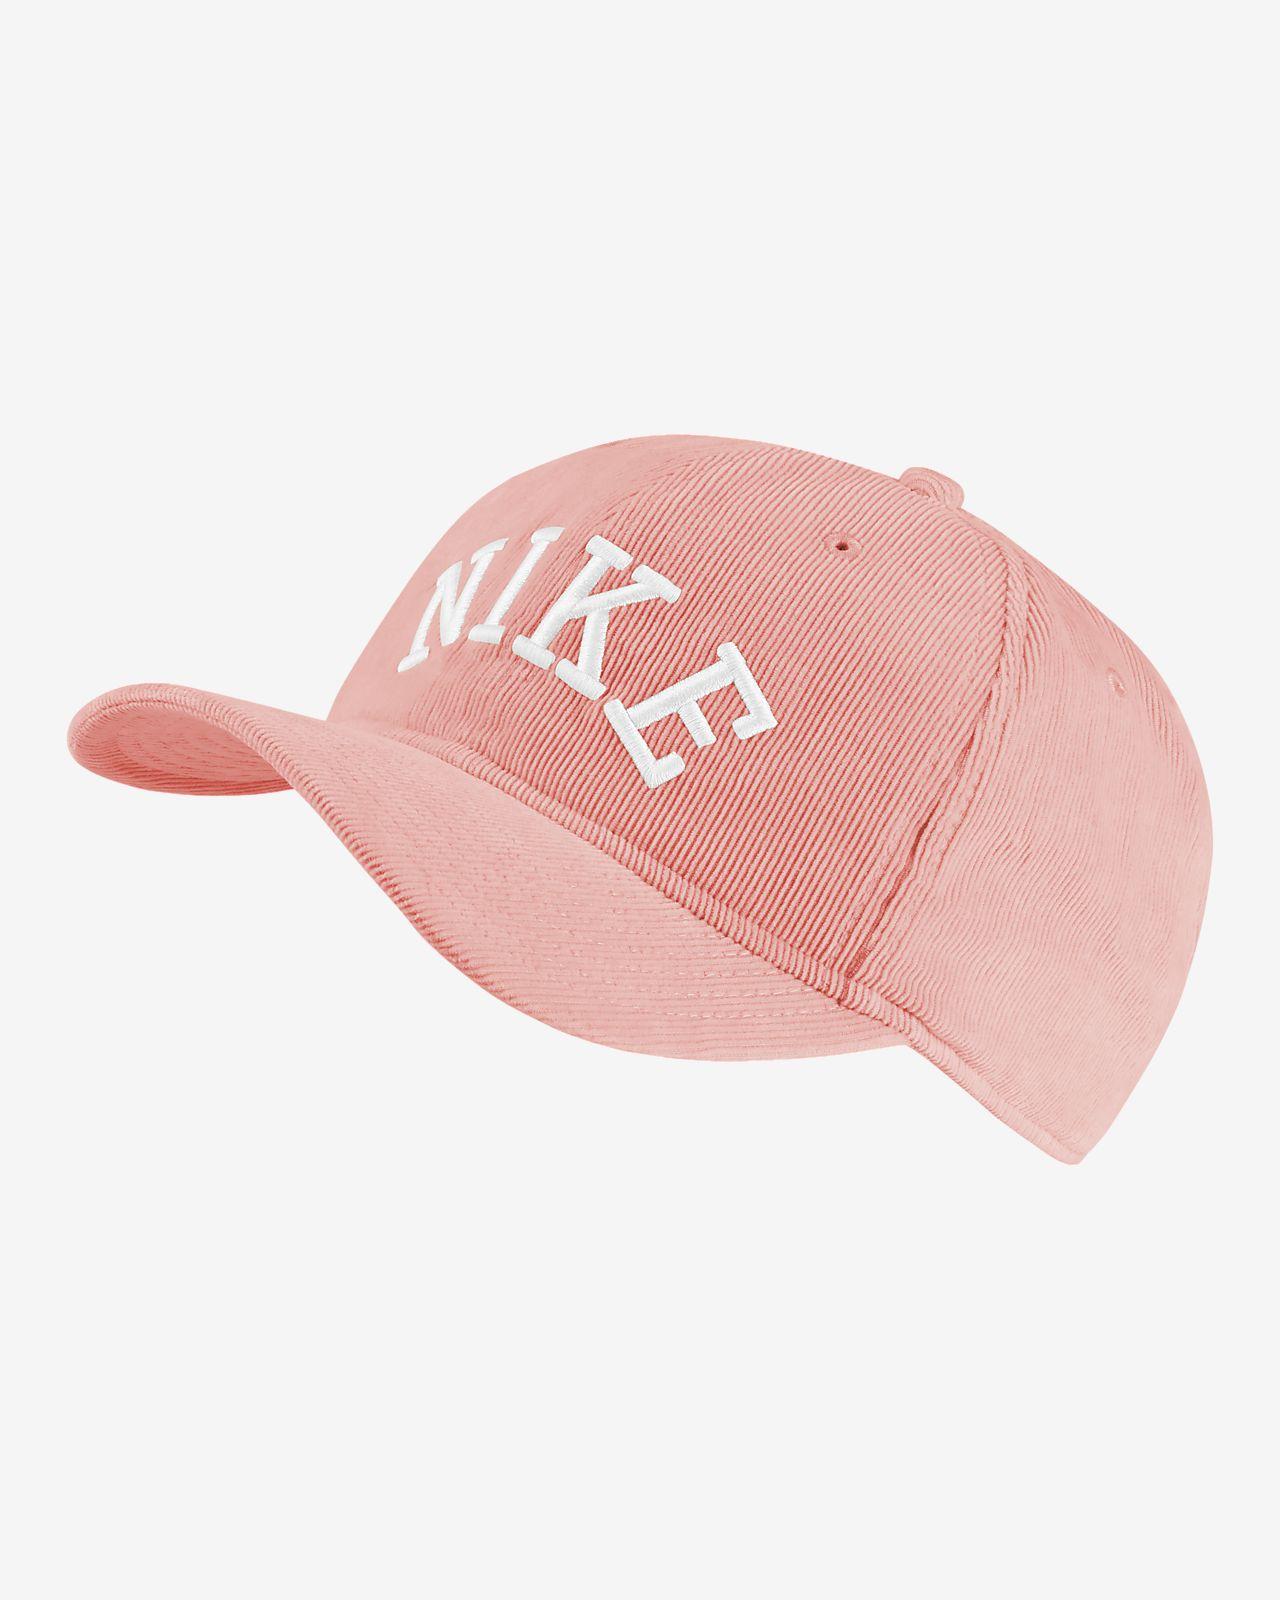 Nike Sportswear Classic99 Washed Block 帽款